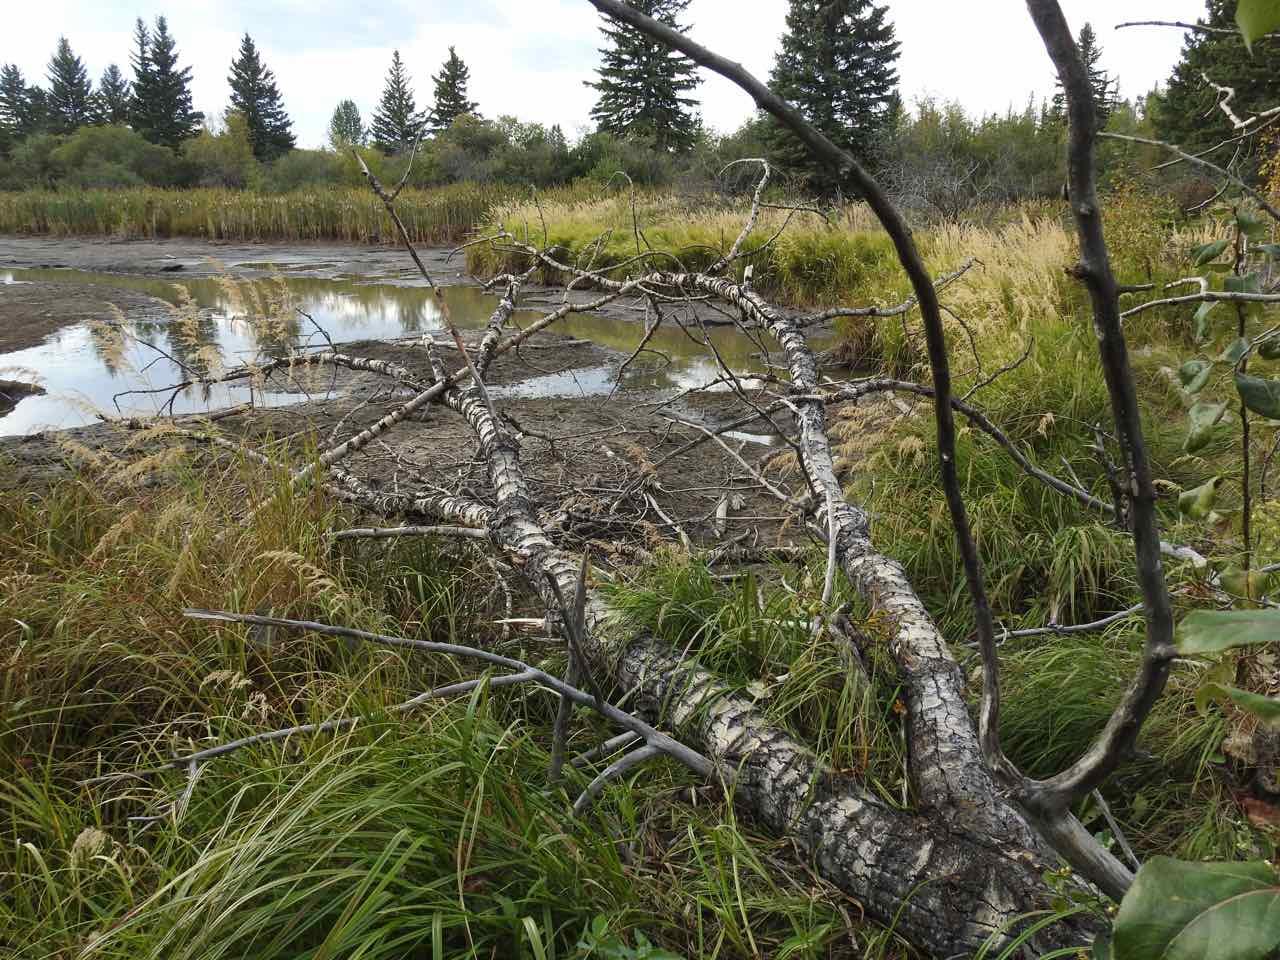 -Beaver_Pond-East_End-Beaver_Seeking_To_Dam_Further_Upstream_On_WC01-Tree_Fall_B2_Sept_16_2017.jpg